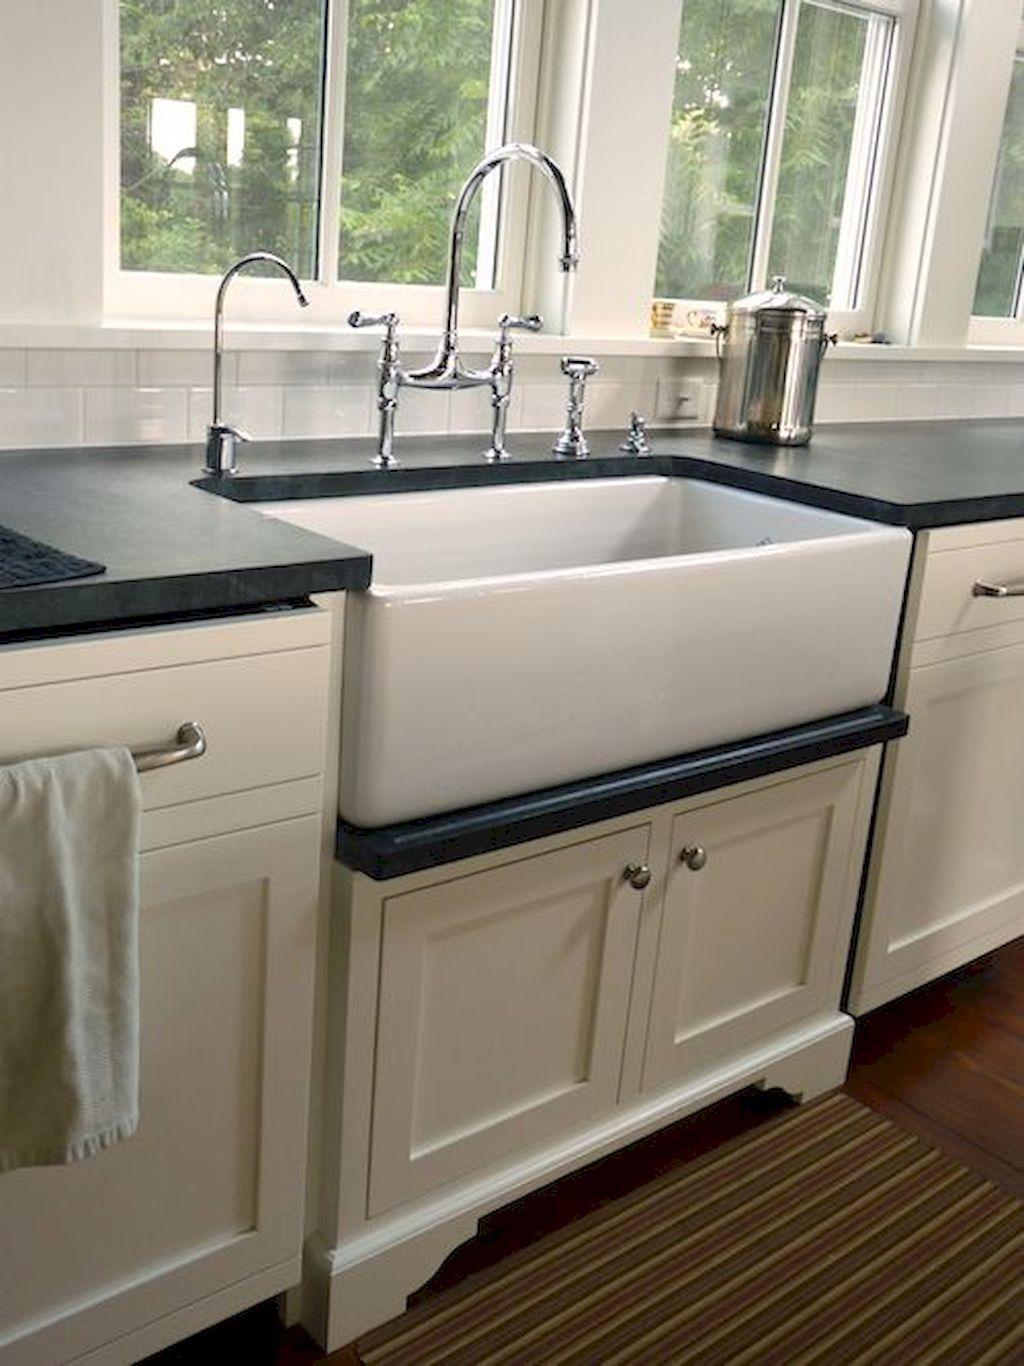 Kitchen Sinks Farmhouse Style 55 best rustic kitchen sink farmhouse style ideas rustic kitchen 55 best rustic kitchen sink farmhouse style ideas workwithnaturefo